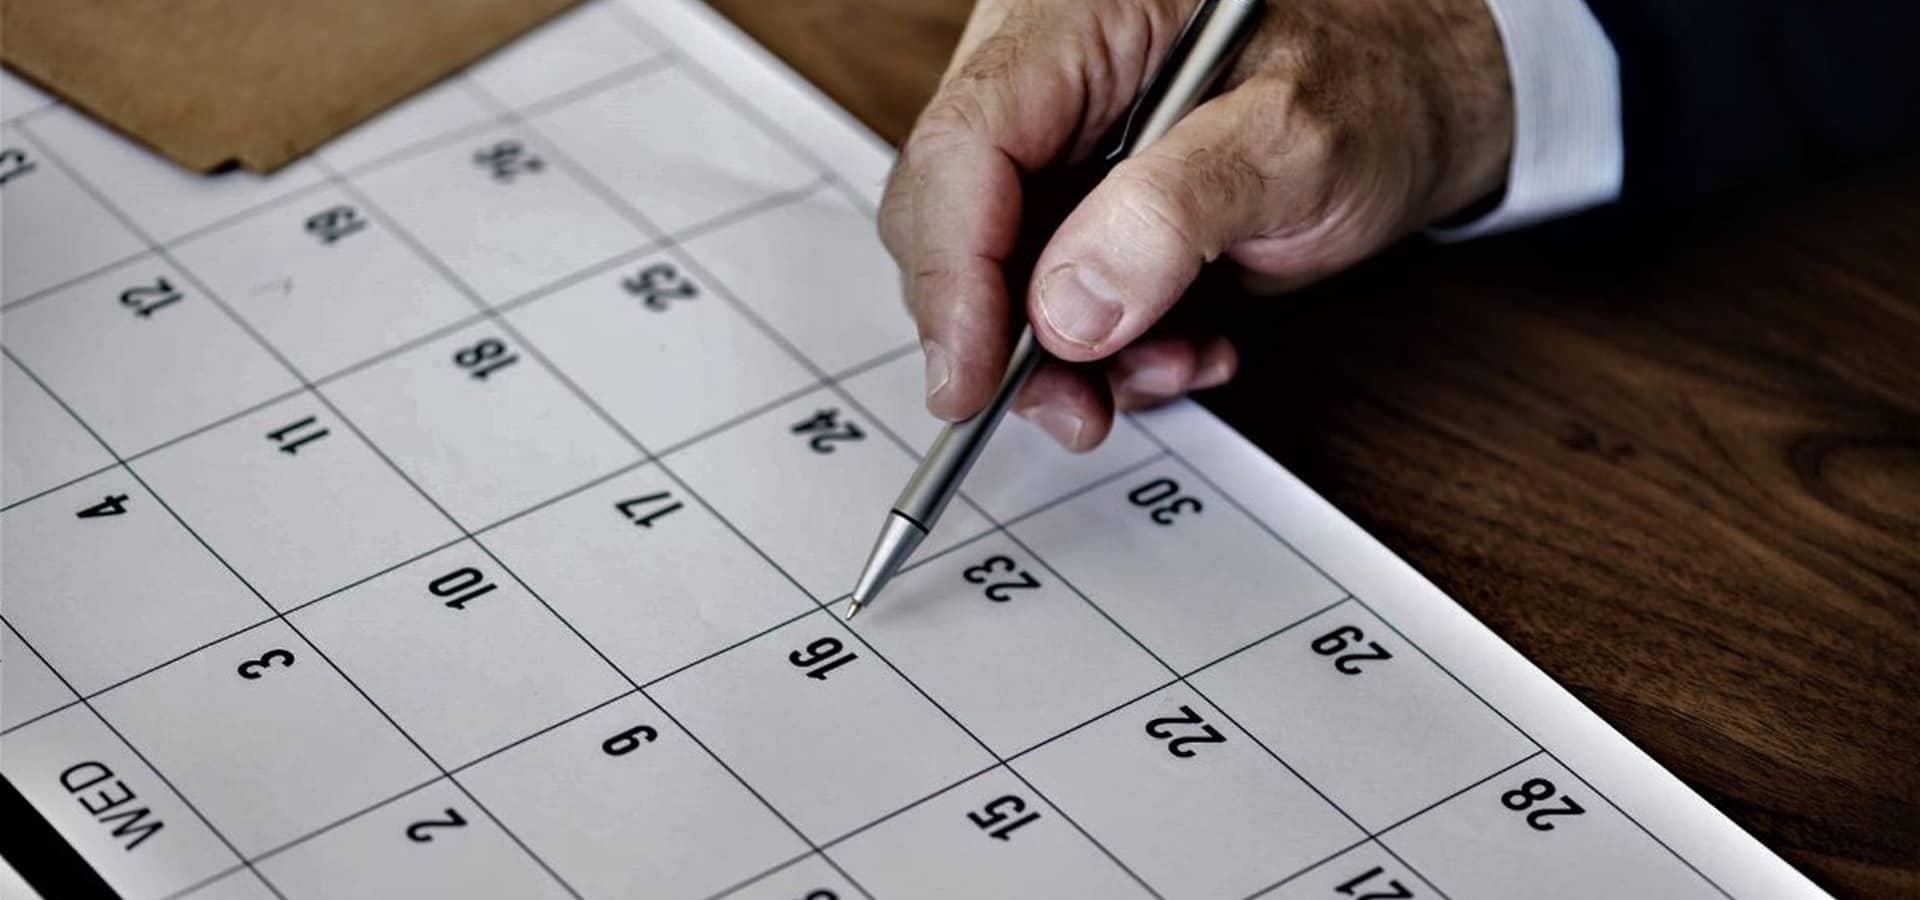 Calendário Fical - SROC - Sociedade de Revisores e Auditores Ribeiro da Cunha Associados